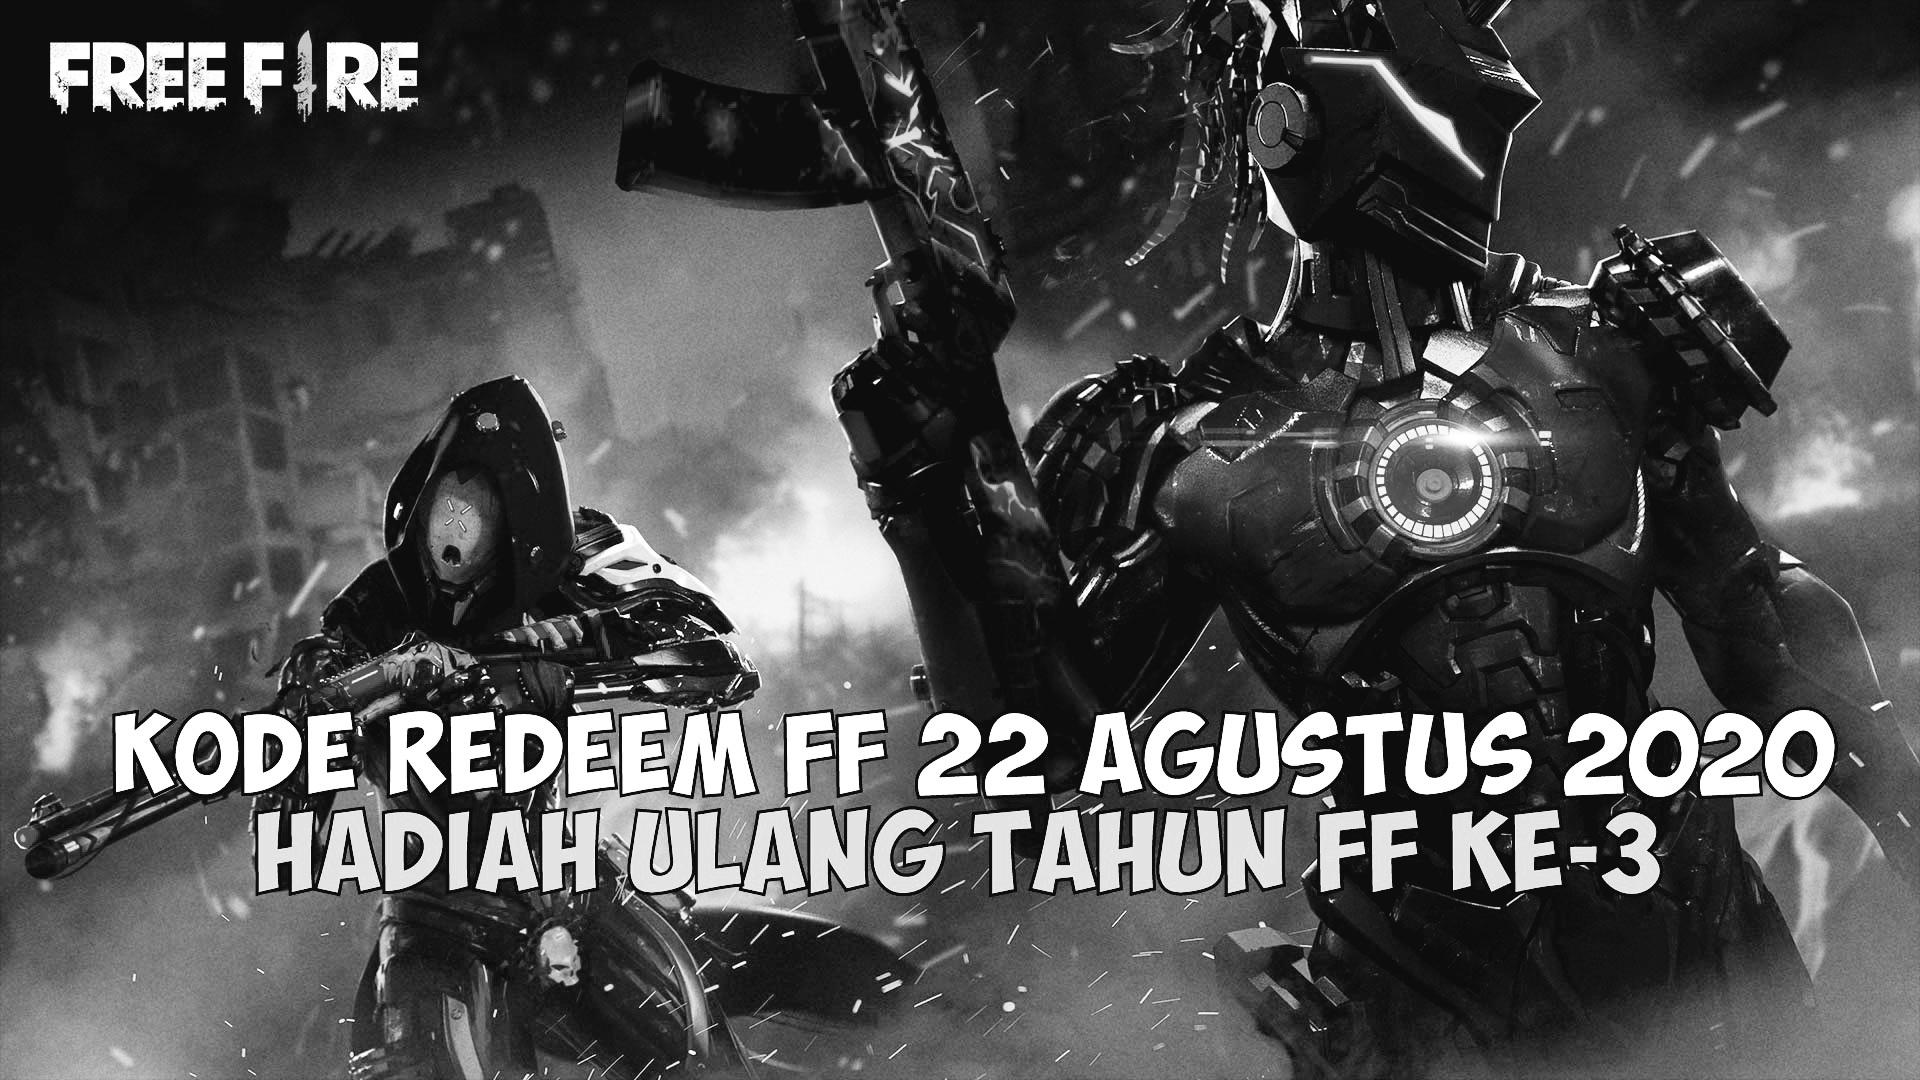 KODE REDEEM FF 22 AGUSTUS 2020 - Kutip ID